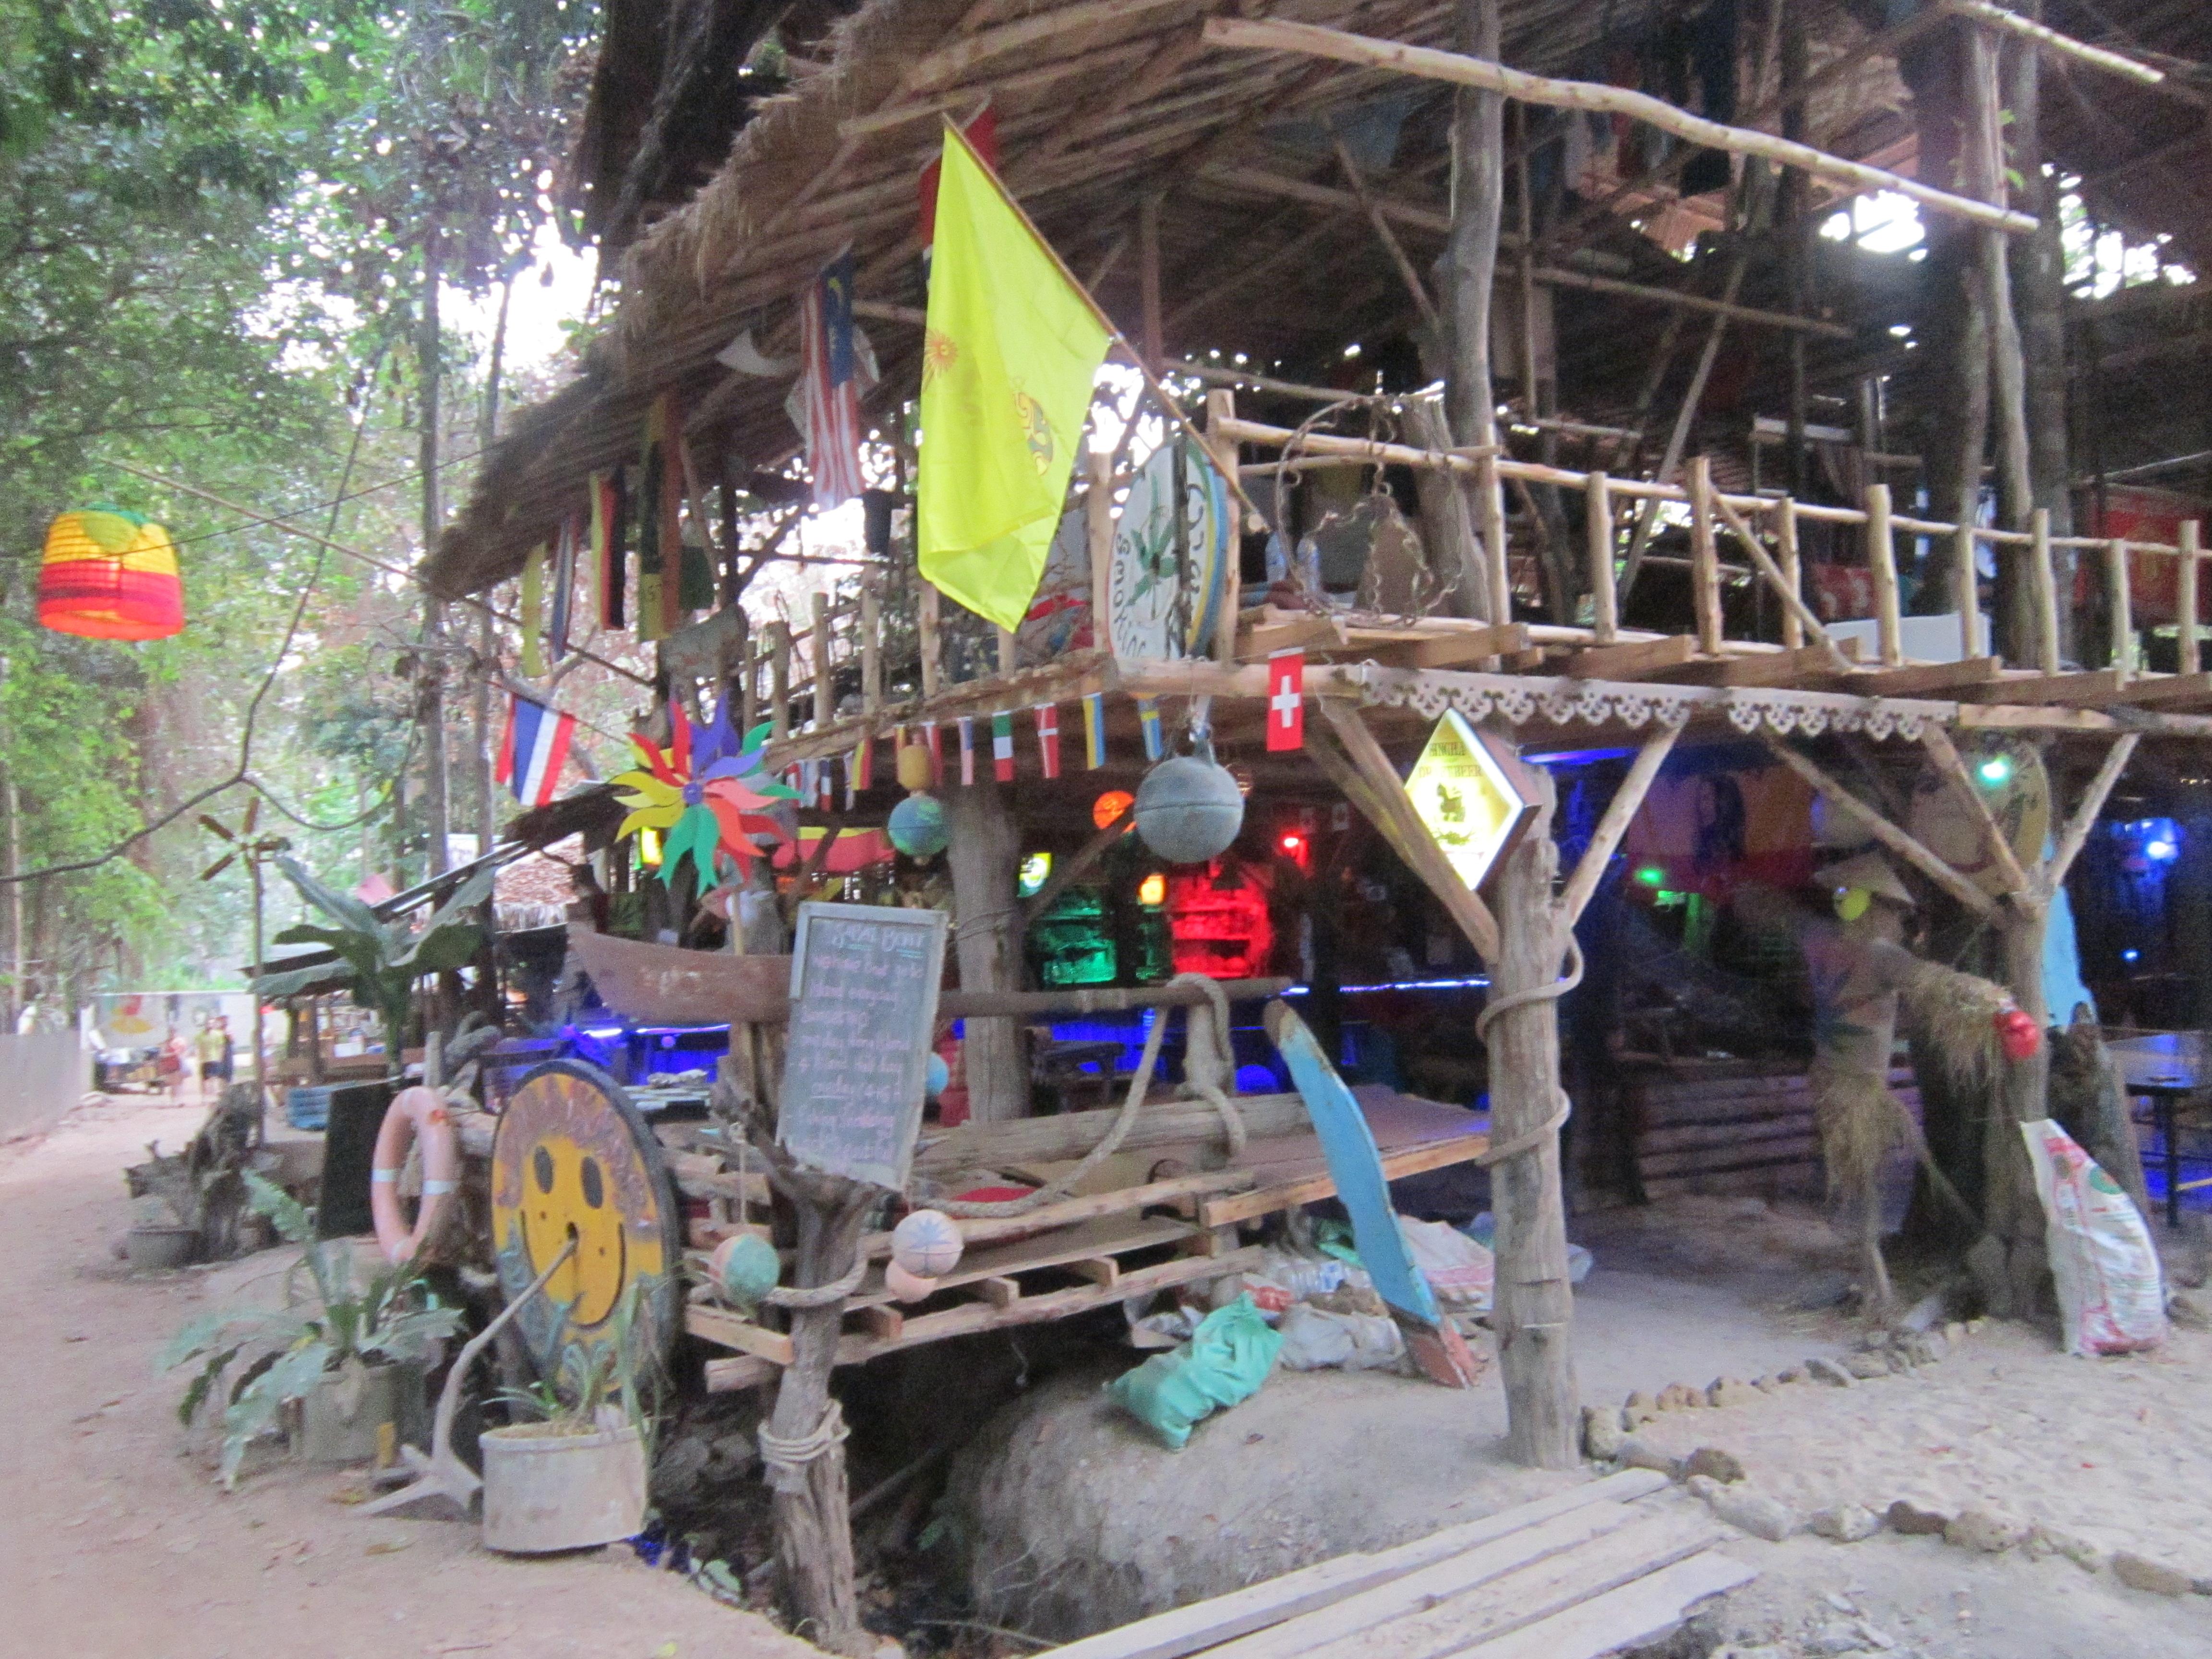 A bar in Tonsai, Thailand. A great solo travel spot.